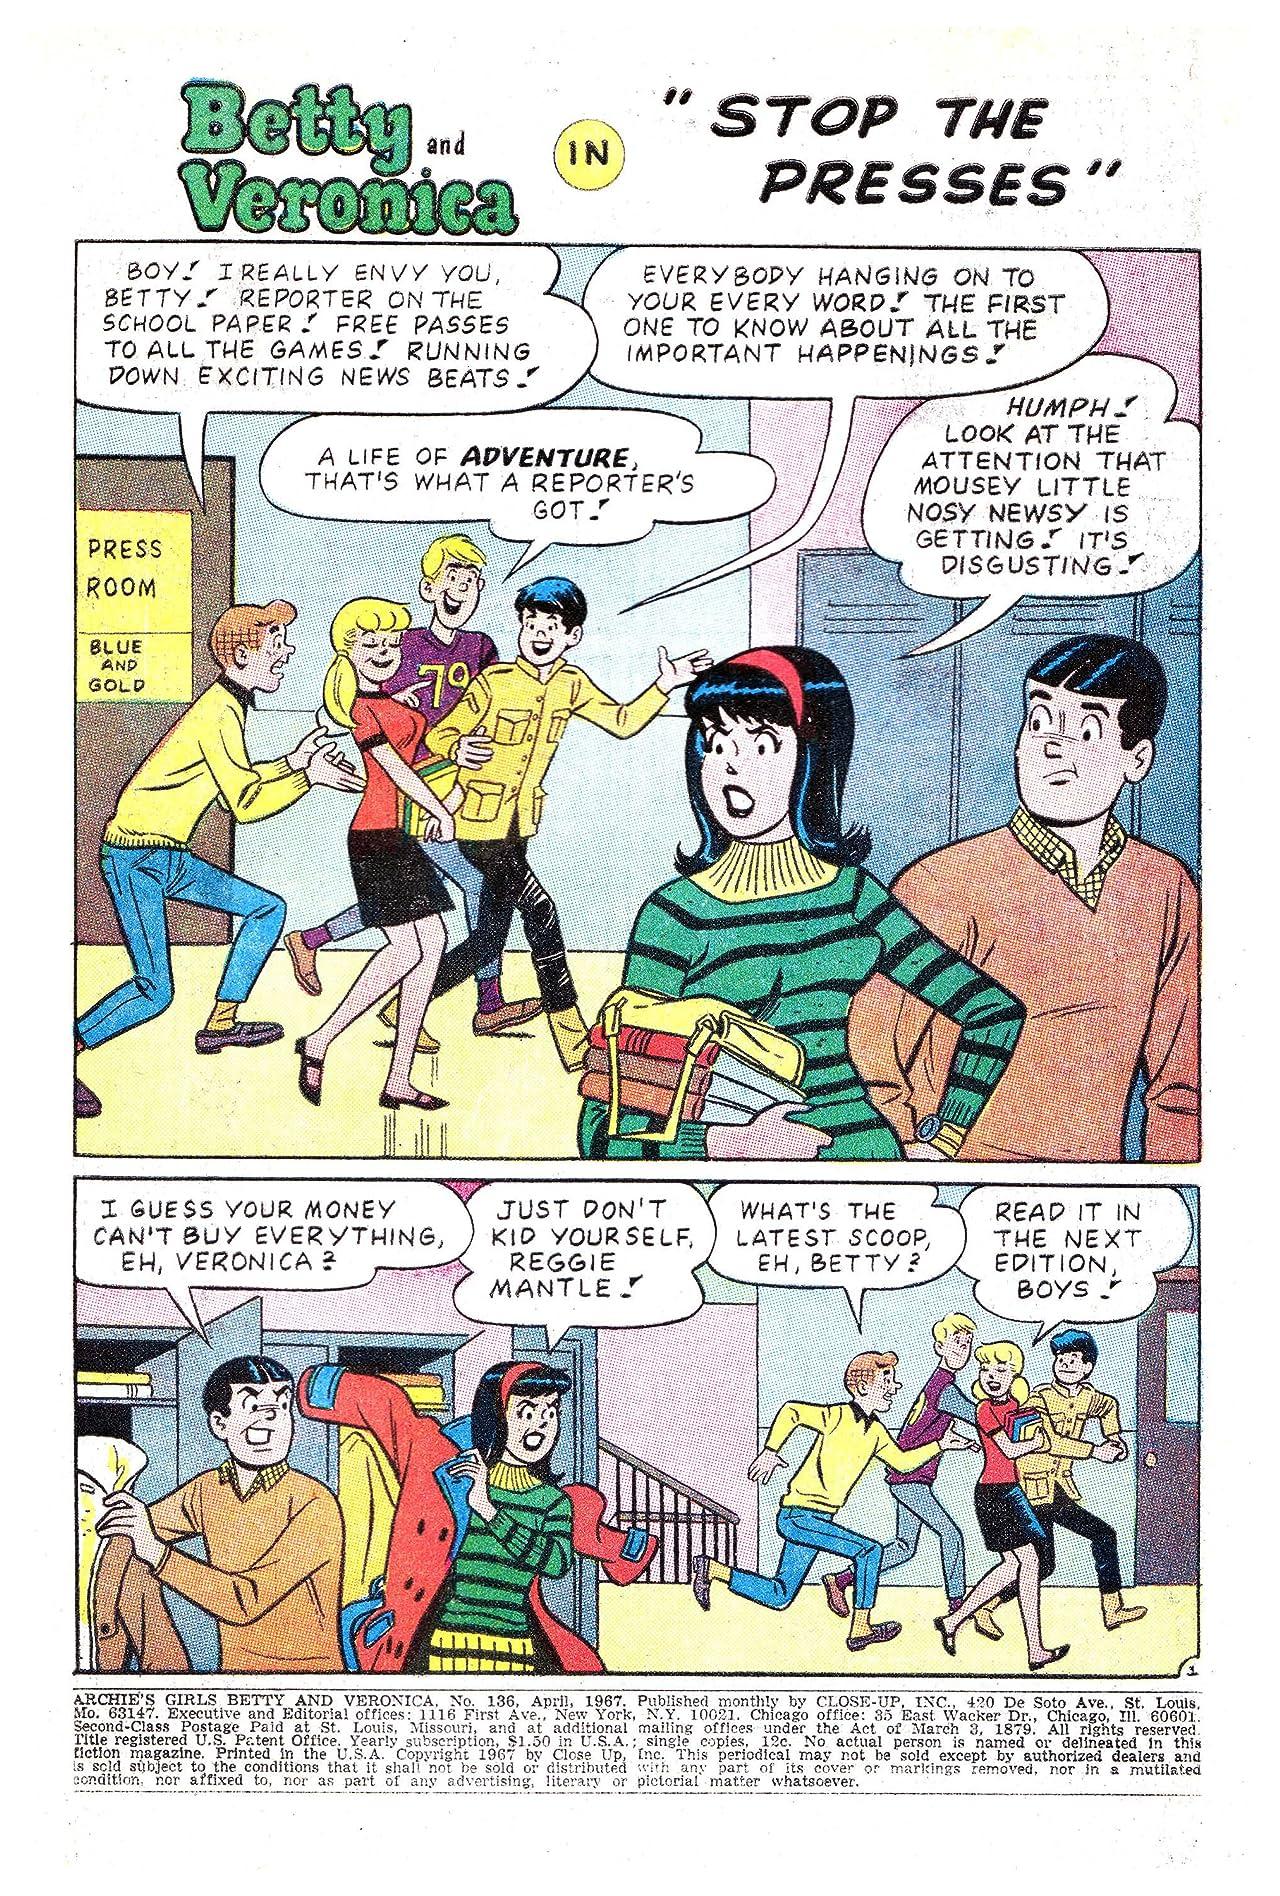 Archie's Girls Betty & Veronica #136